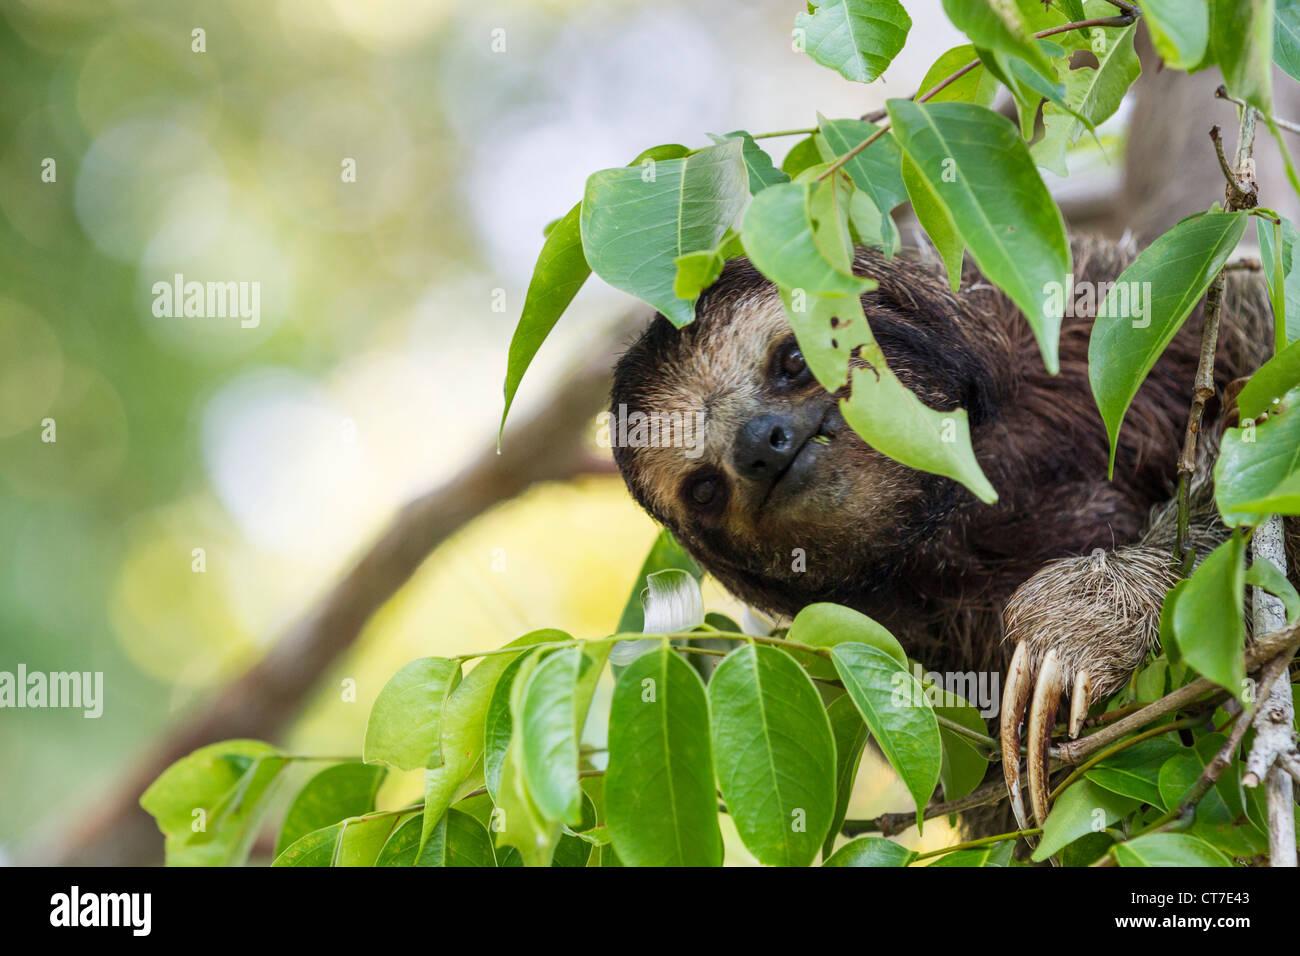 Three-toed sloth (Bradypus variegatus) foraging on Isla Carenero, Bocas del Toro, Panama. Stock Photo